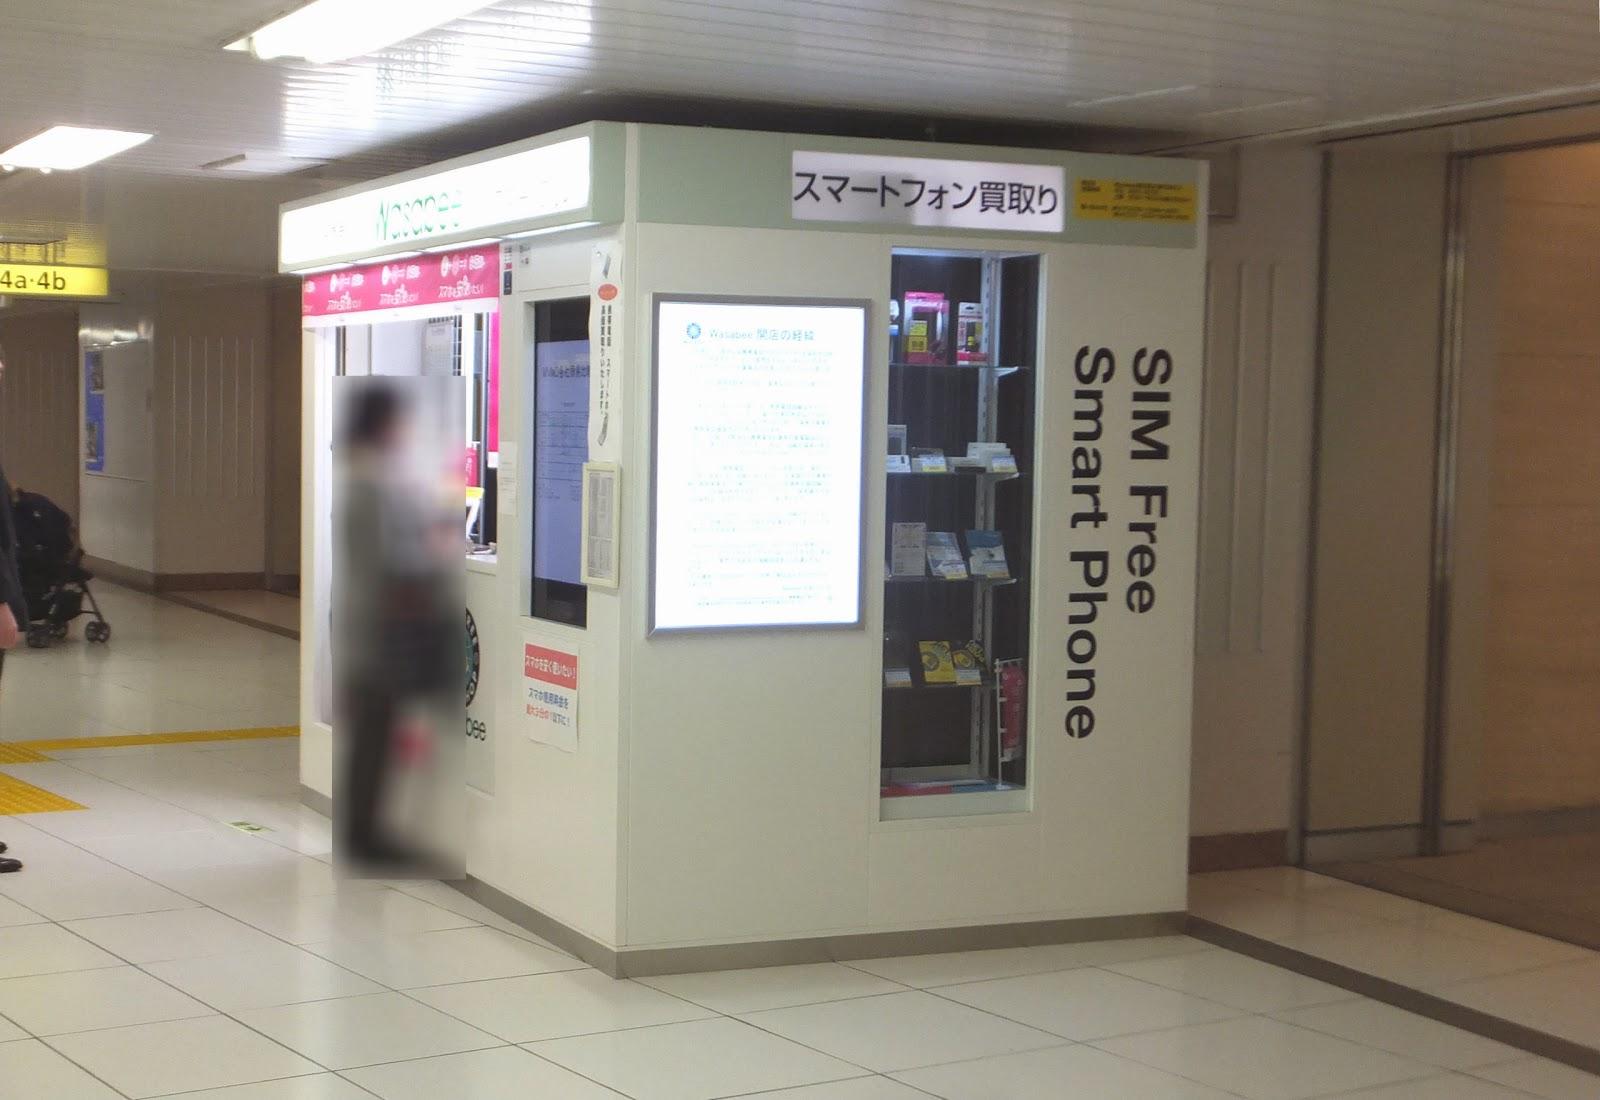 Wasabee-shop-tokyo-station 東京駅Wasabee